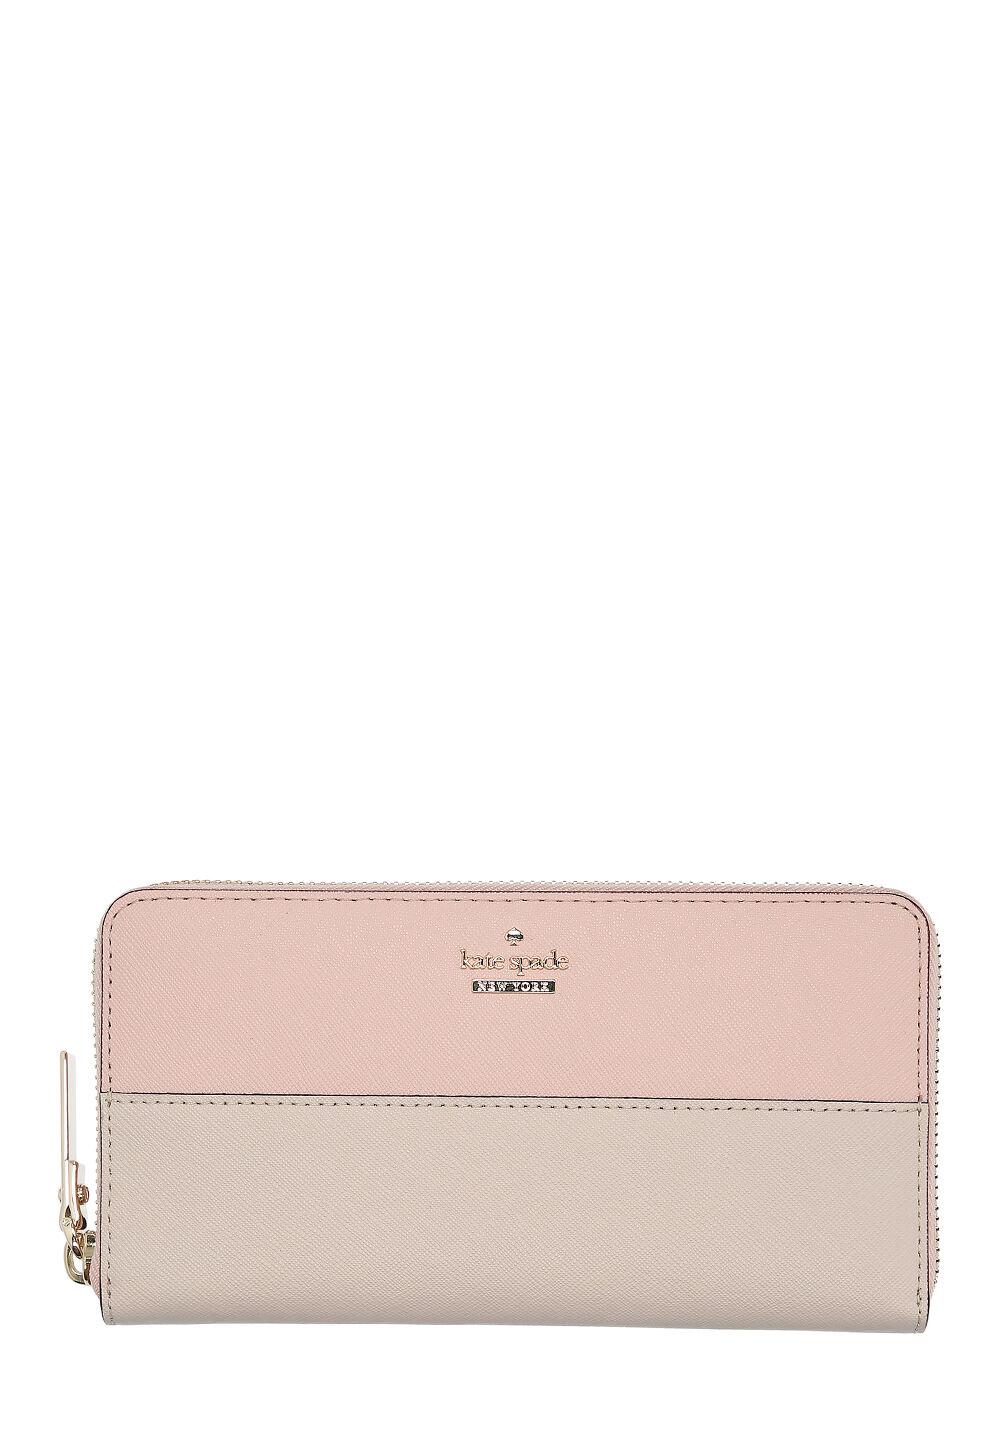 c54e8f16360b20 Kate Spade Portemonnaie Cameron, Leder, B19 x H10 x T2 cm rosa